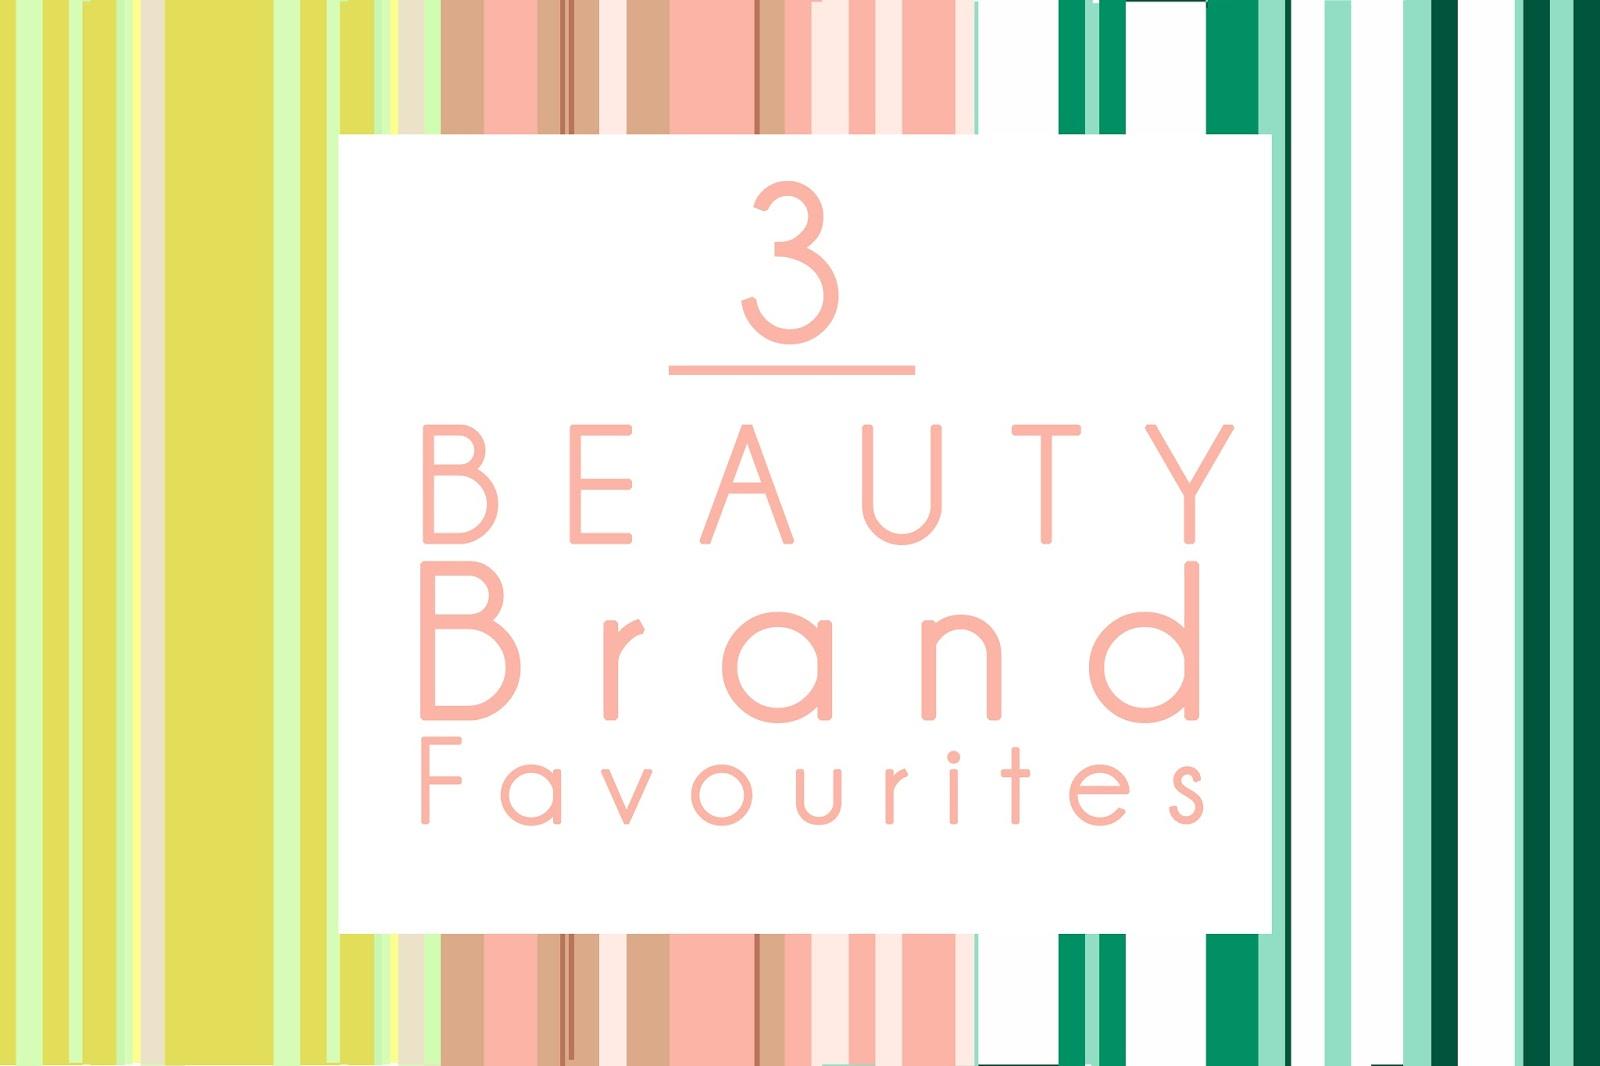 3 BEAUTY brand favourites